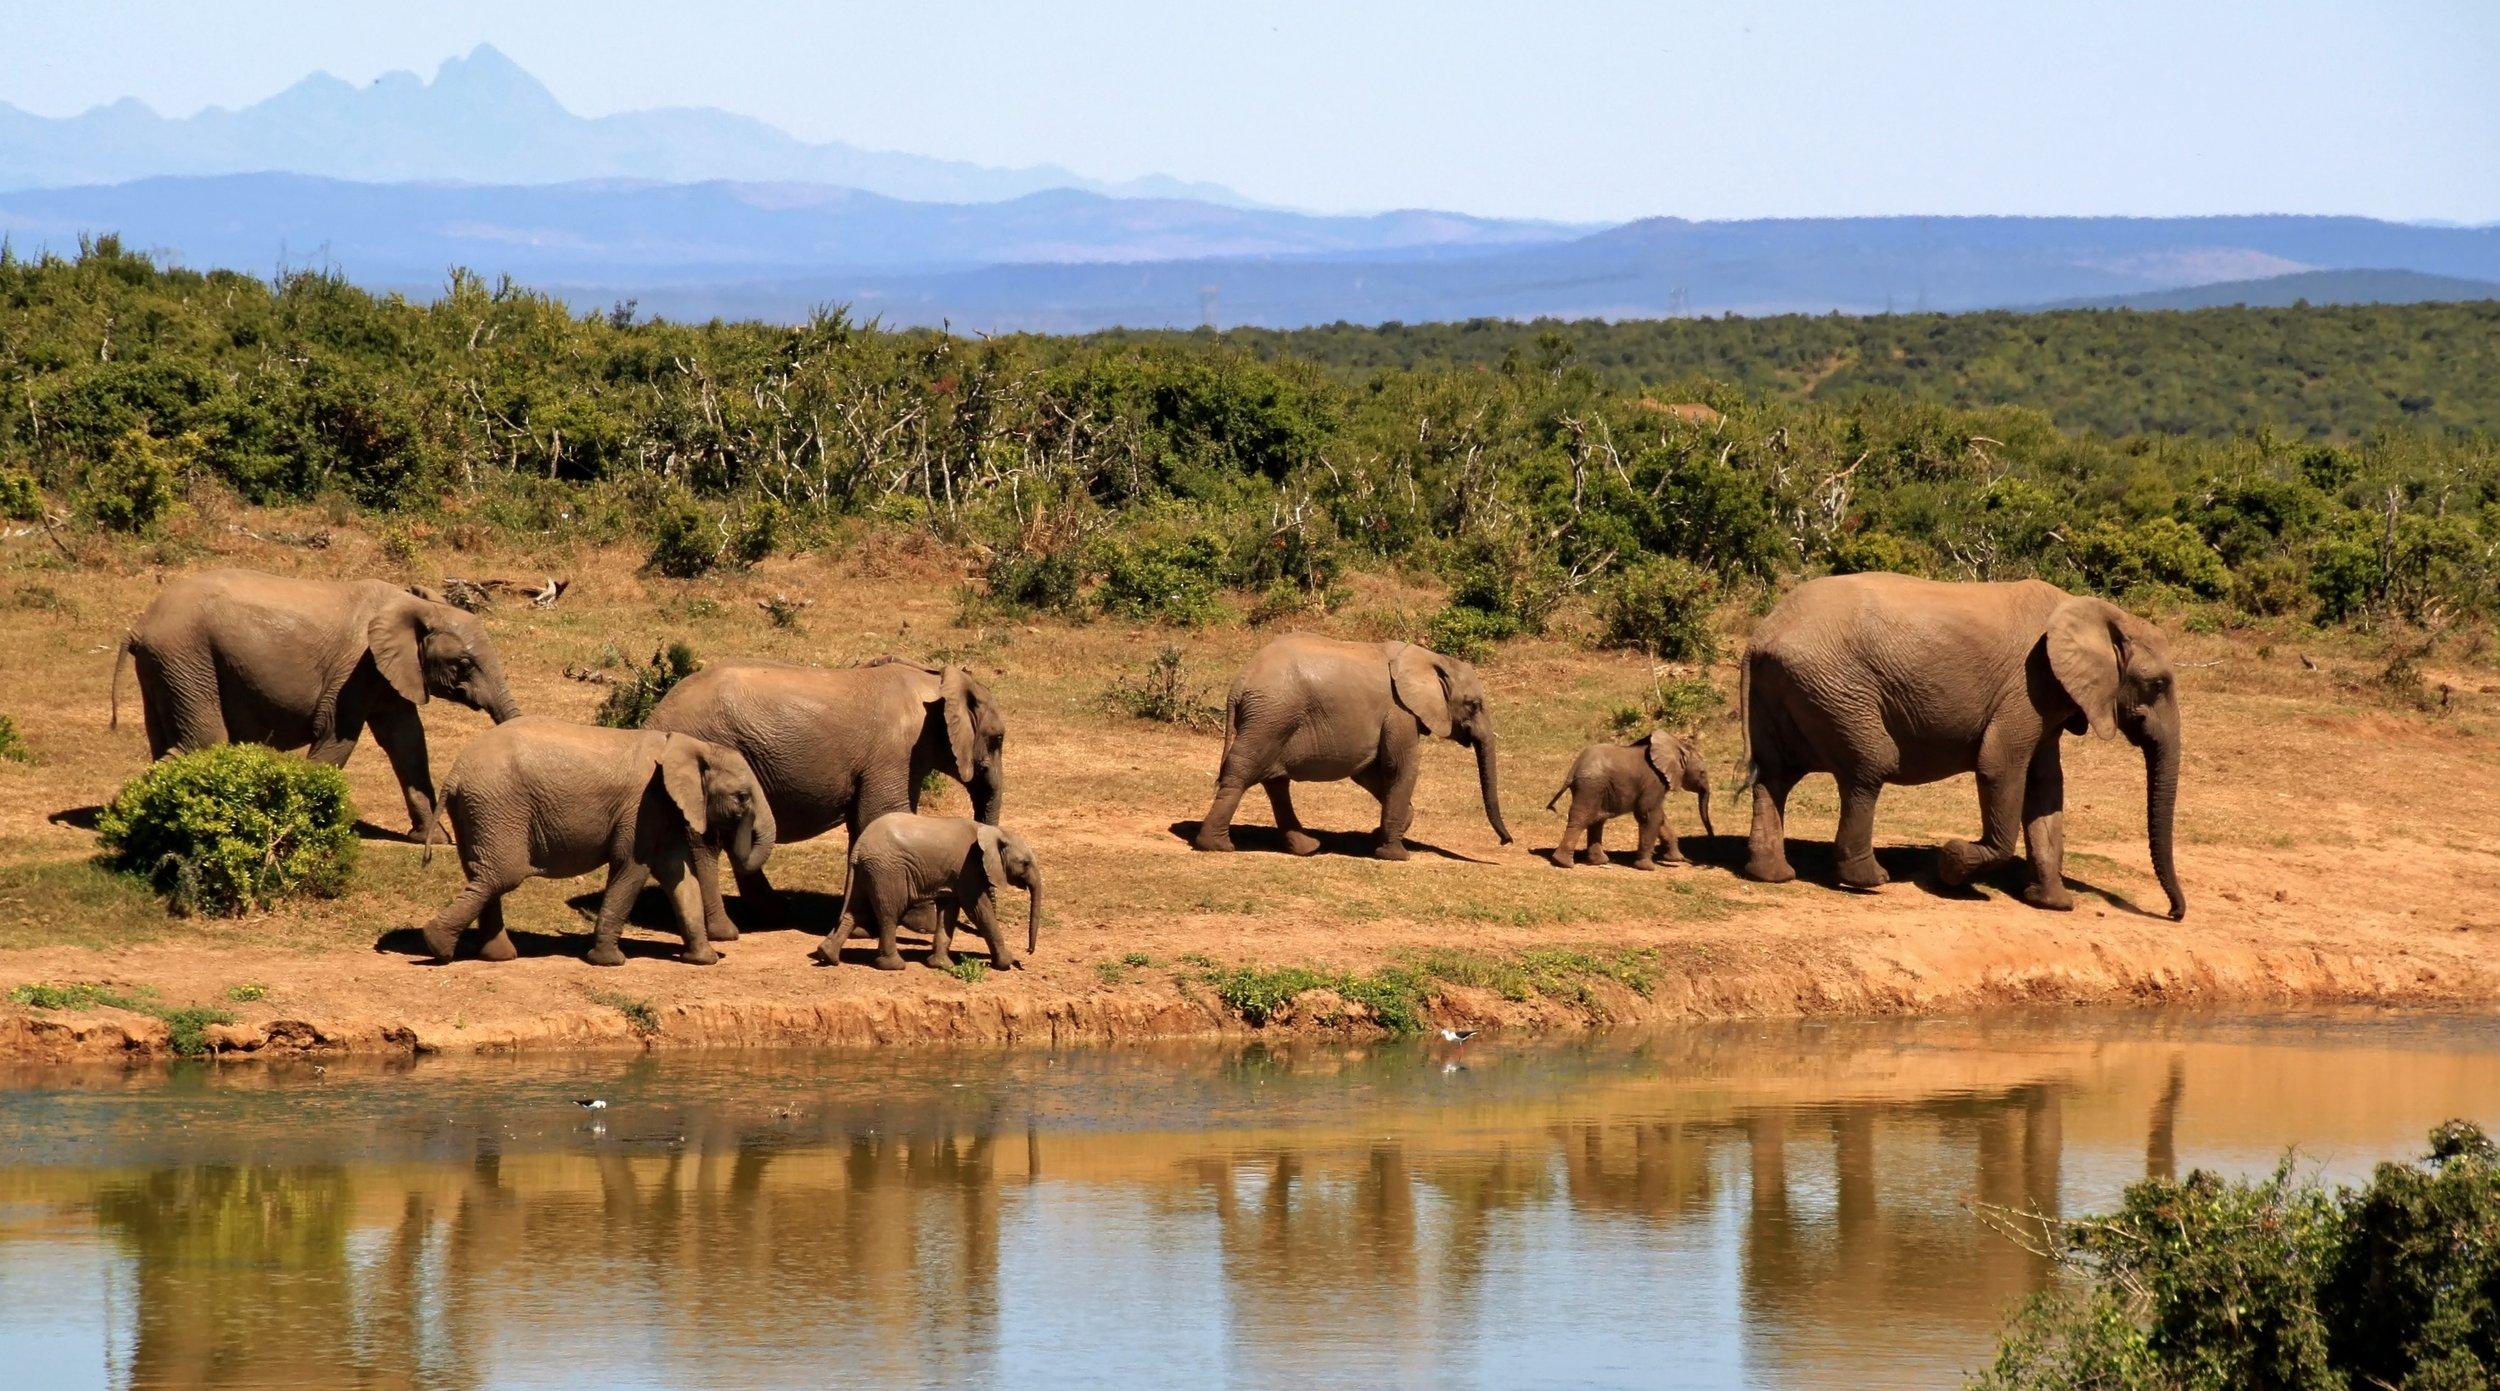 085 TAAL Africa2.jpeg